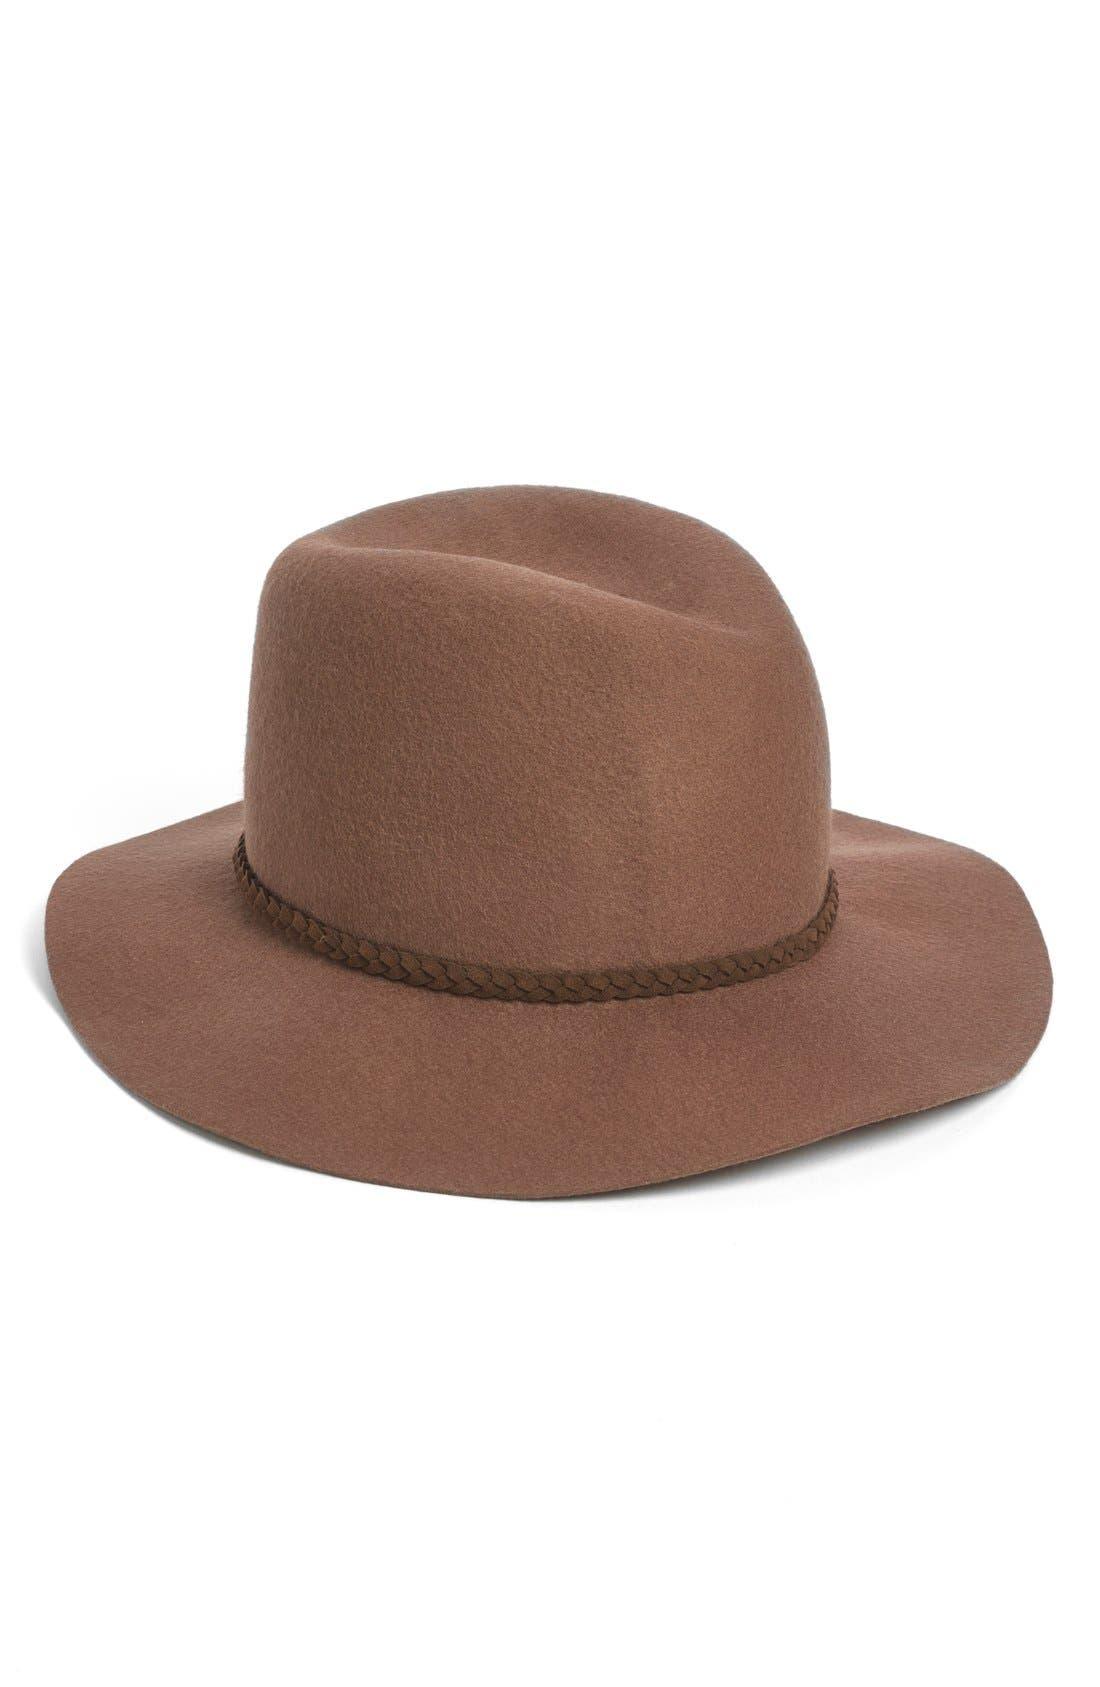 Alternate Image 1 Selected - Hinge Felt Panama Hat